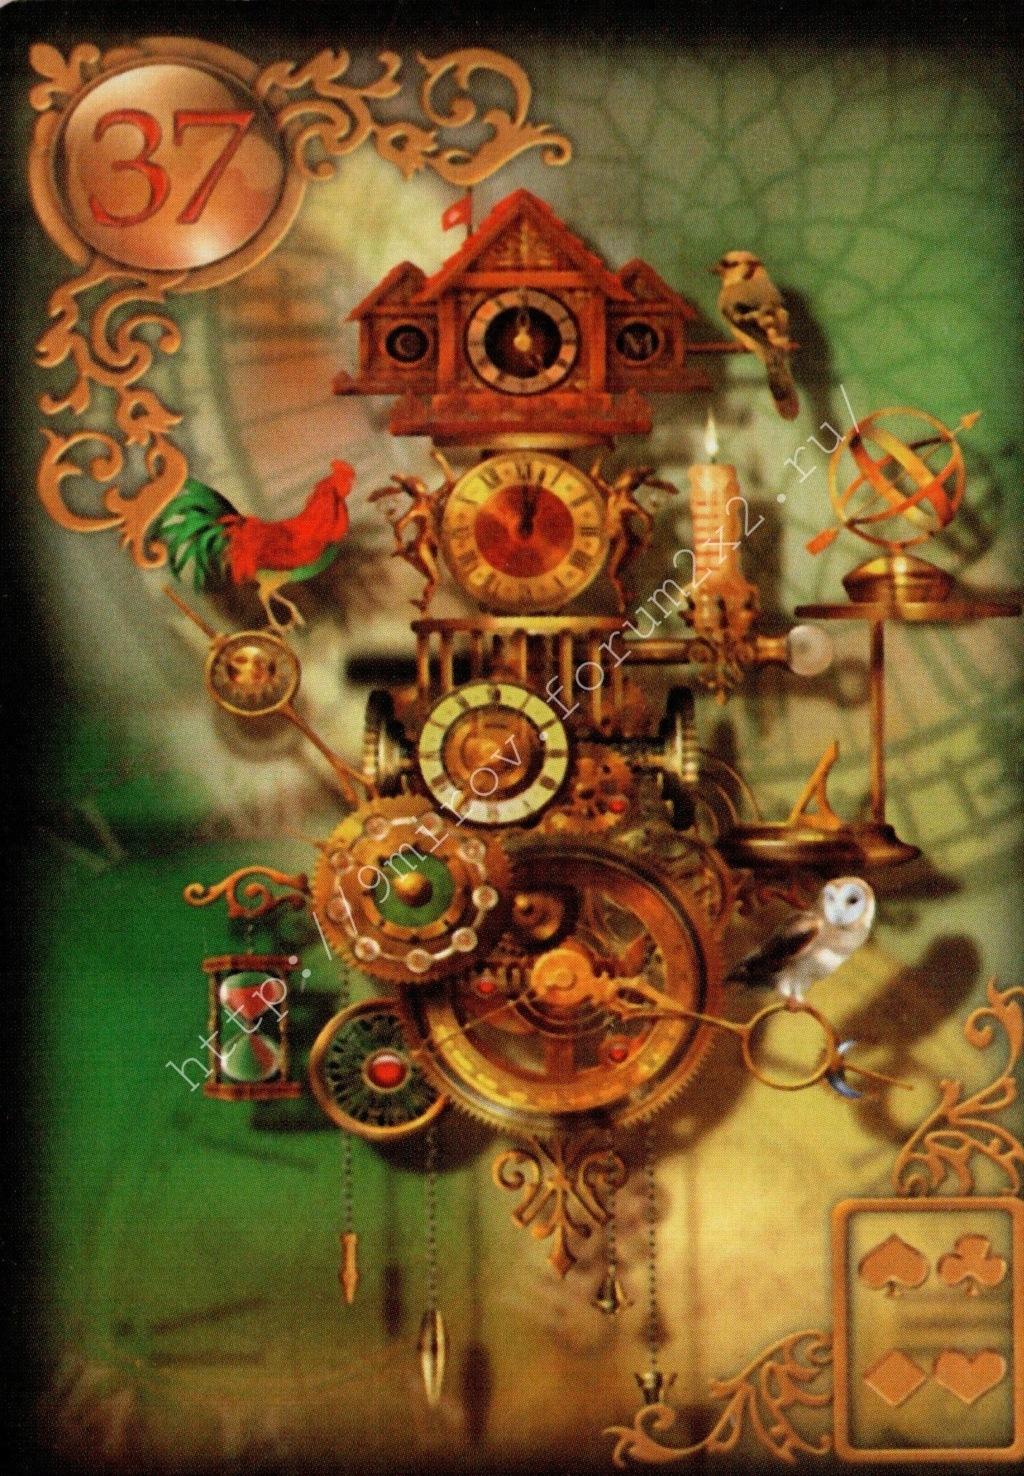 Золотые мечты Ленорман (Расширенное издание) | Gilded Reverie Lenormand. Галерея.  Water130